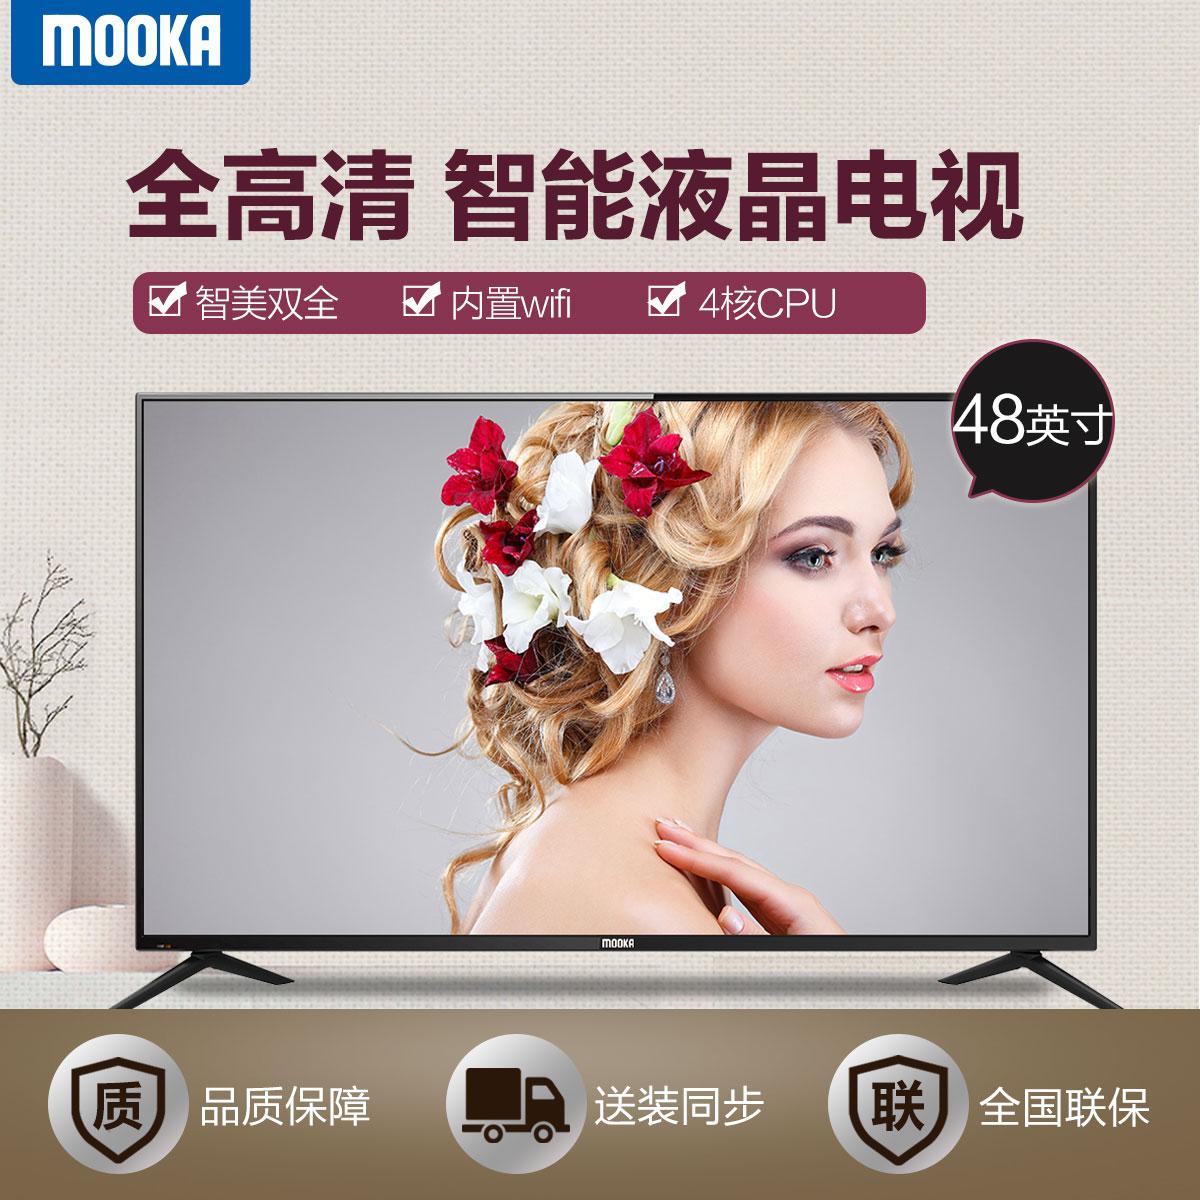 MOOKA/模卡 彩电 48A6M